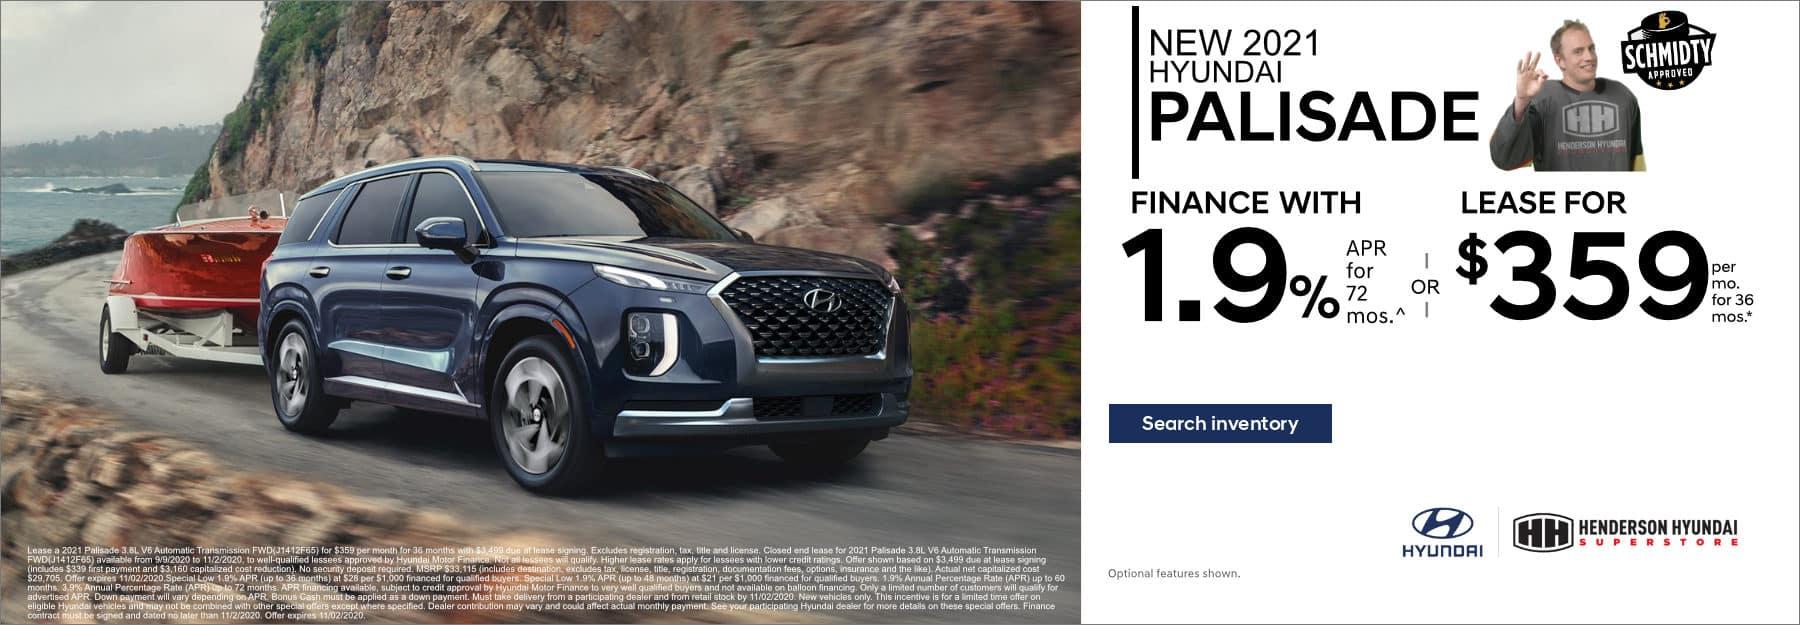 September-2020_2021_PALISADE_Henderson_Hyundai_1400x514